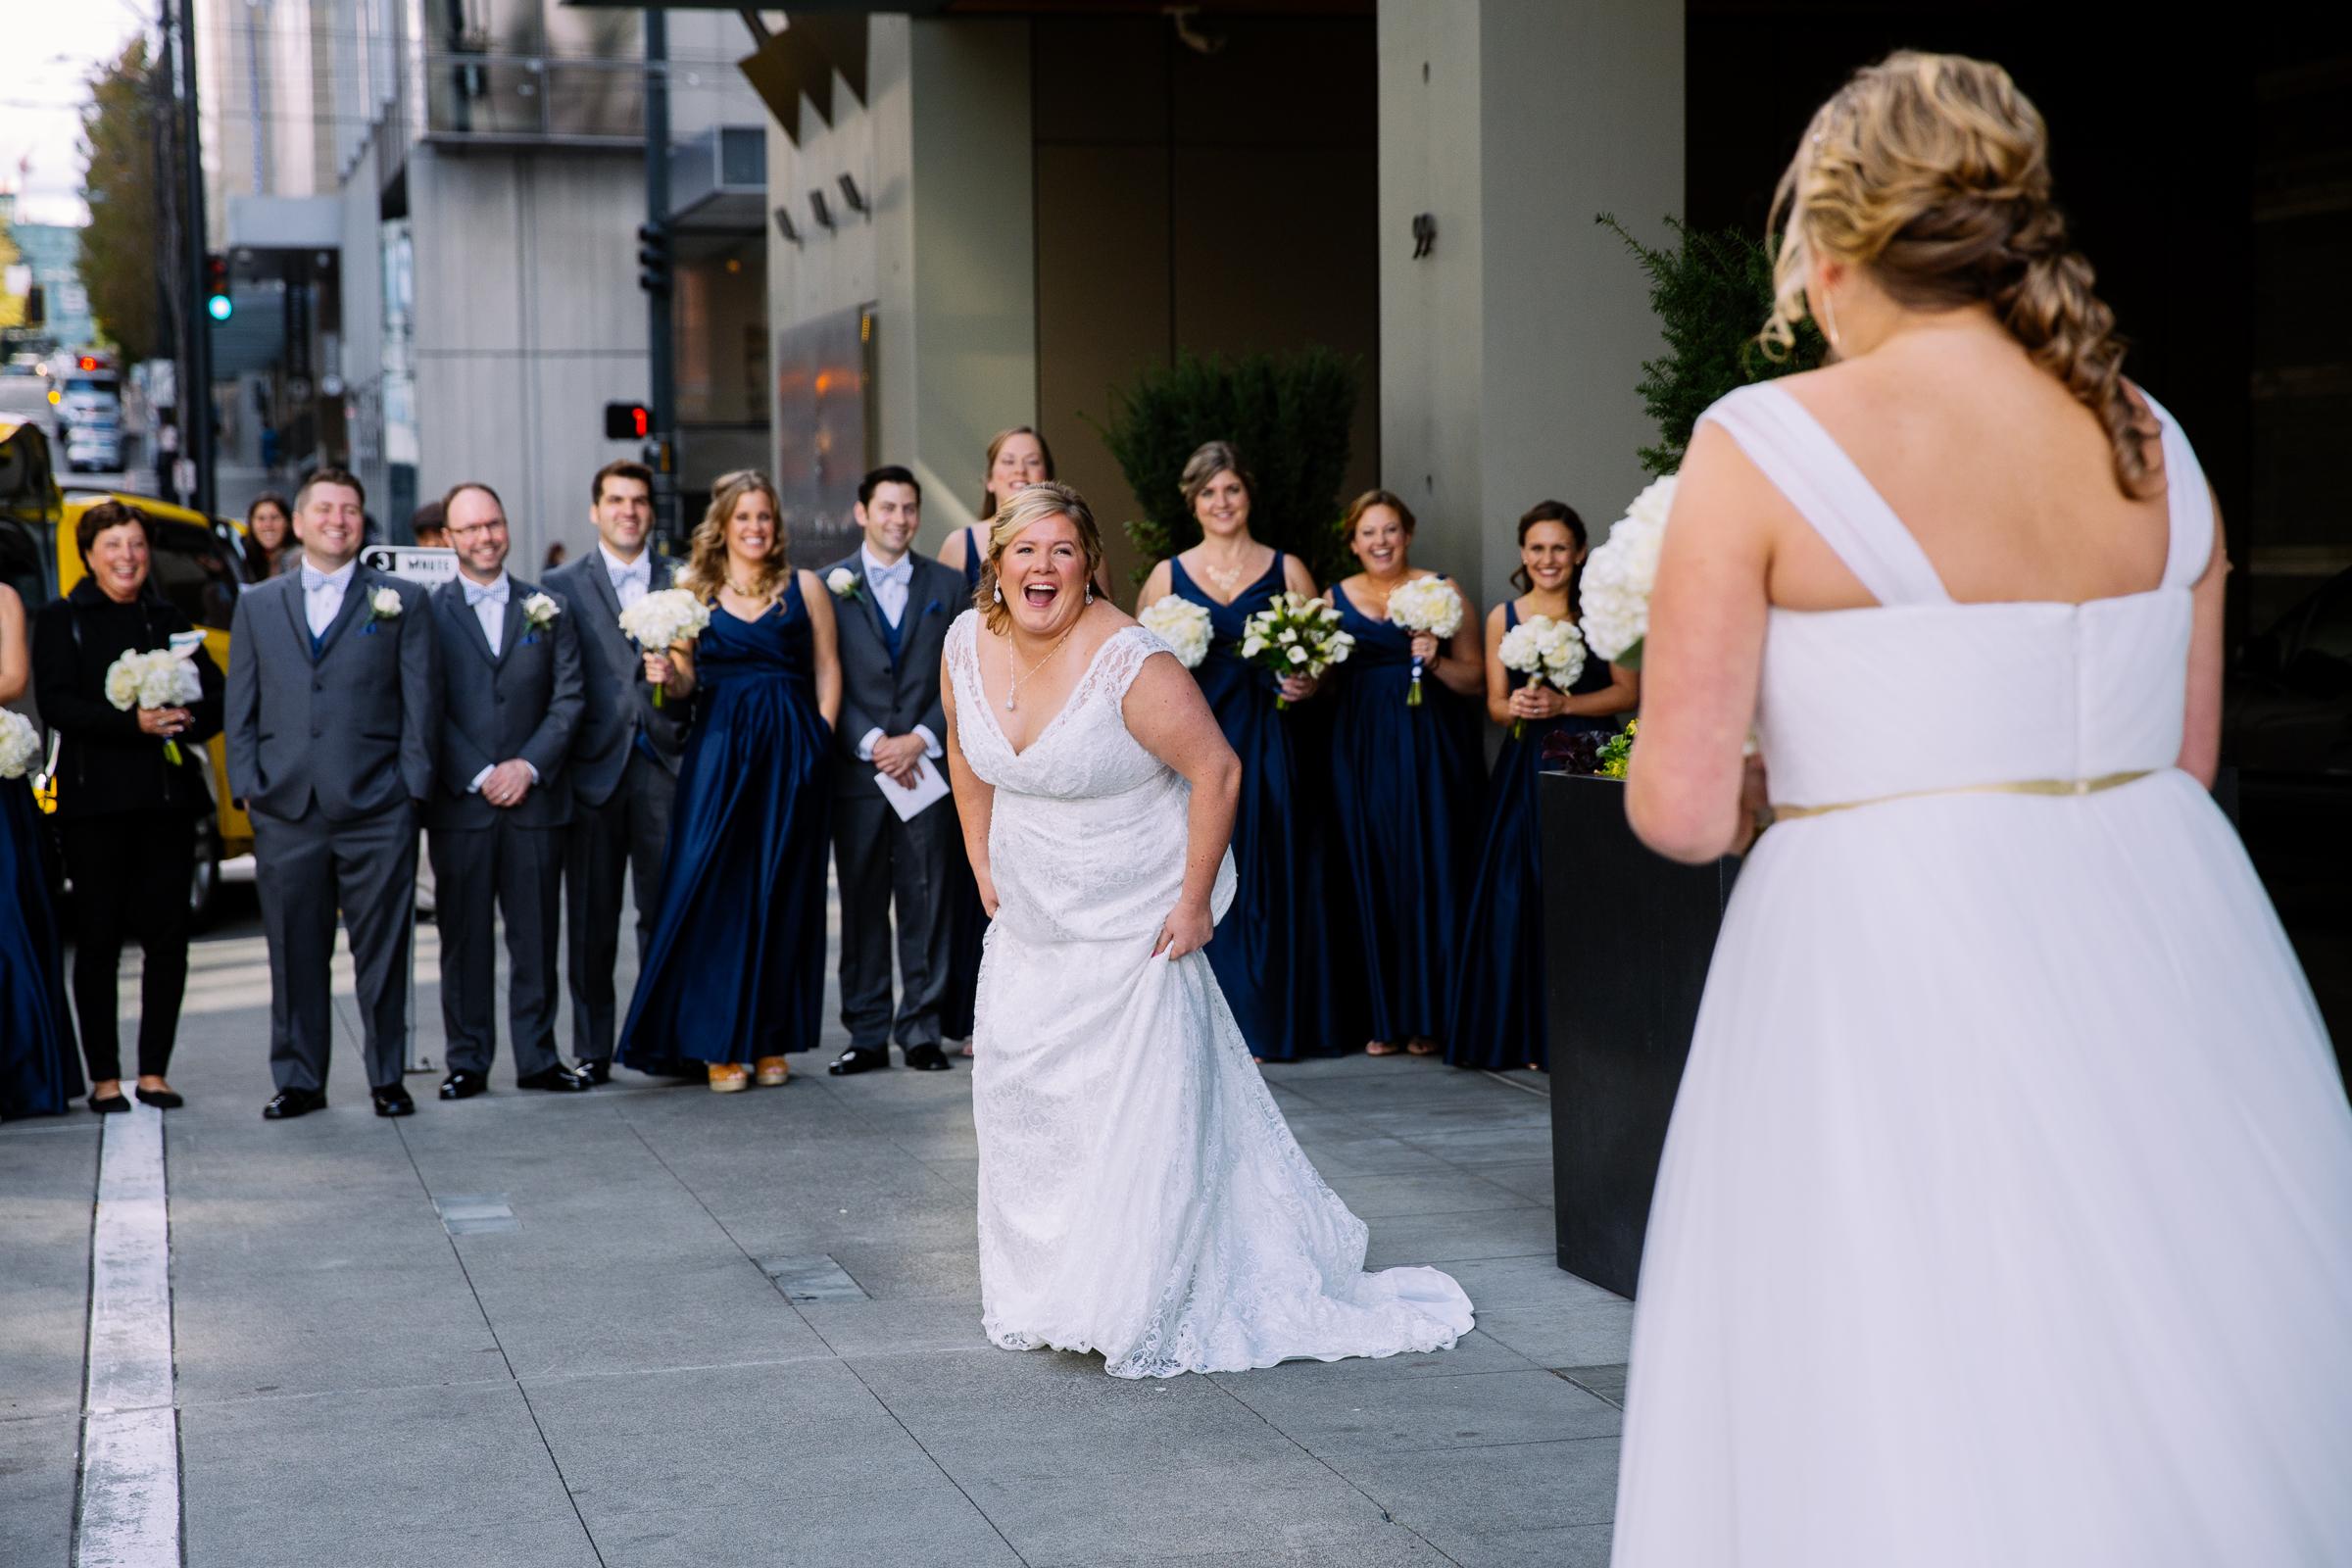 EK Wedding edit 2-14.jpg